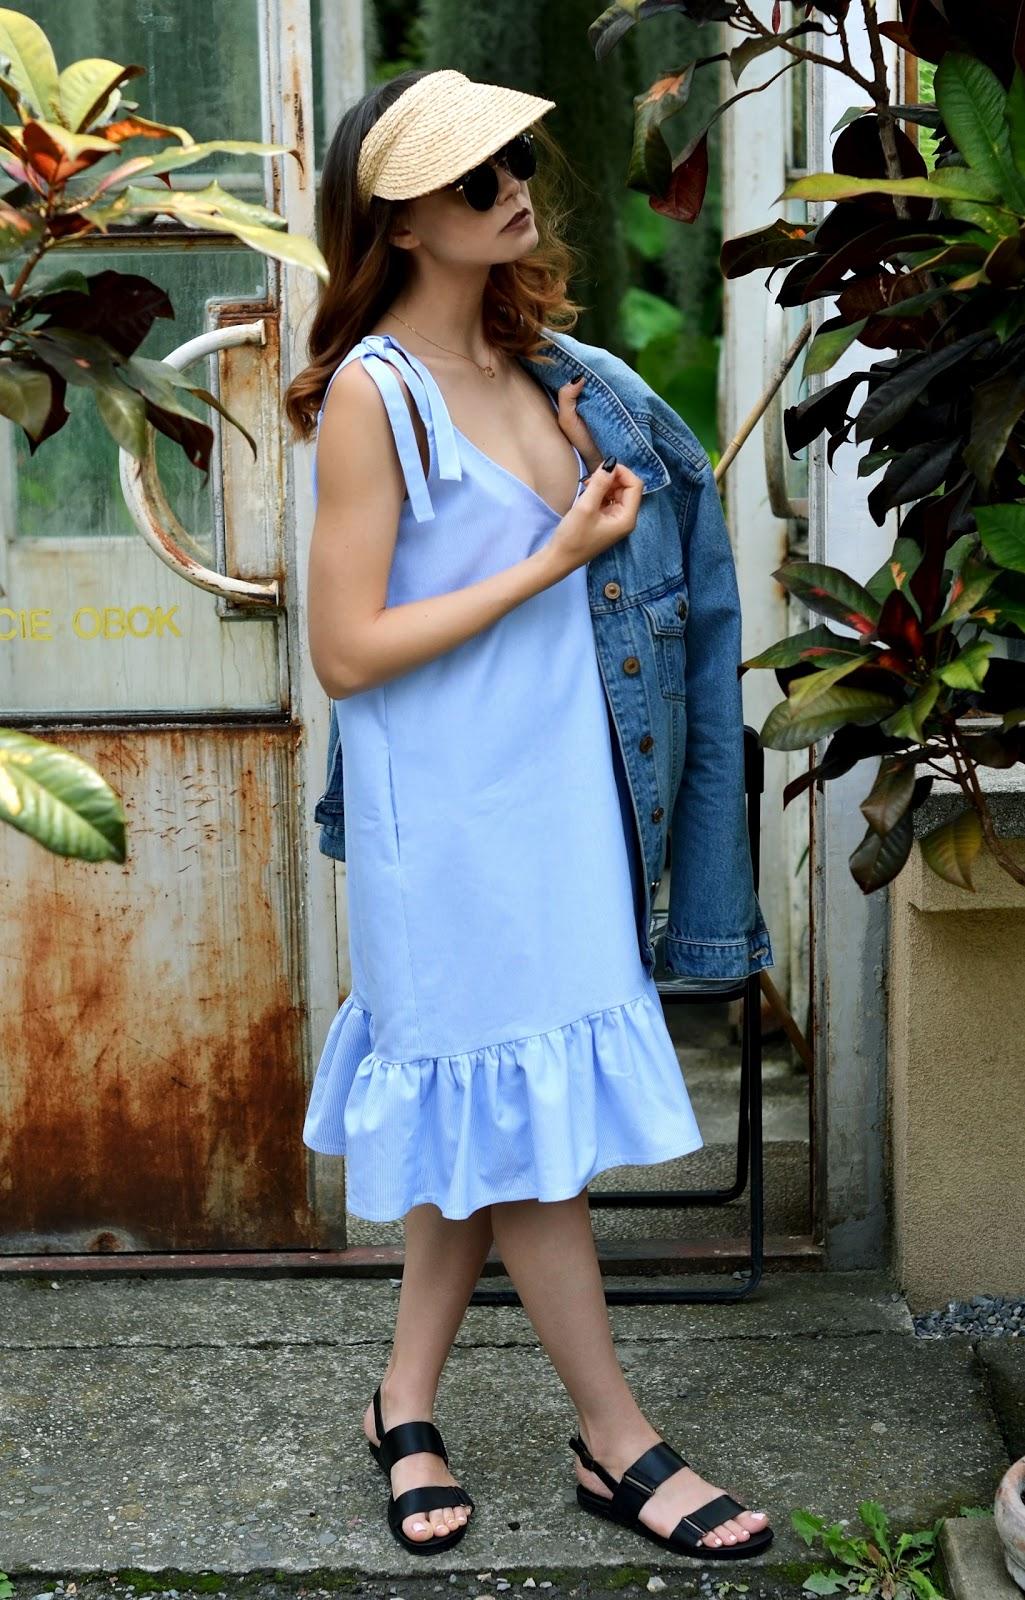 sandaly teva | blog modowy | moda | psyhcologia | styl zycia | cammy blog